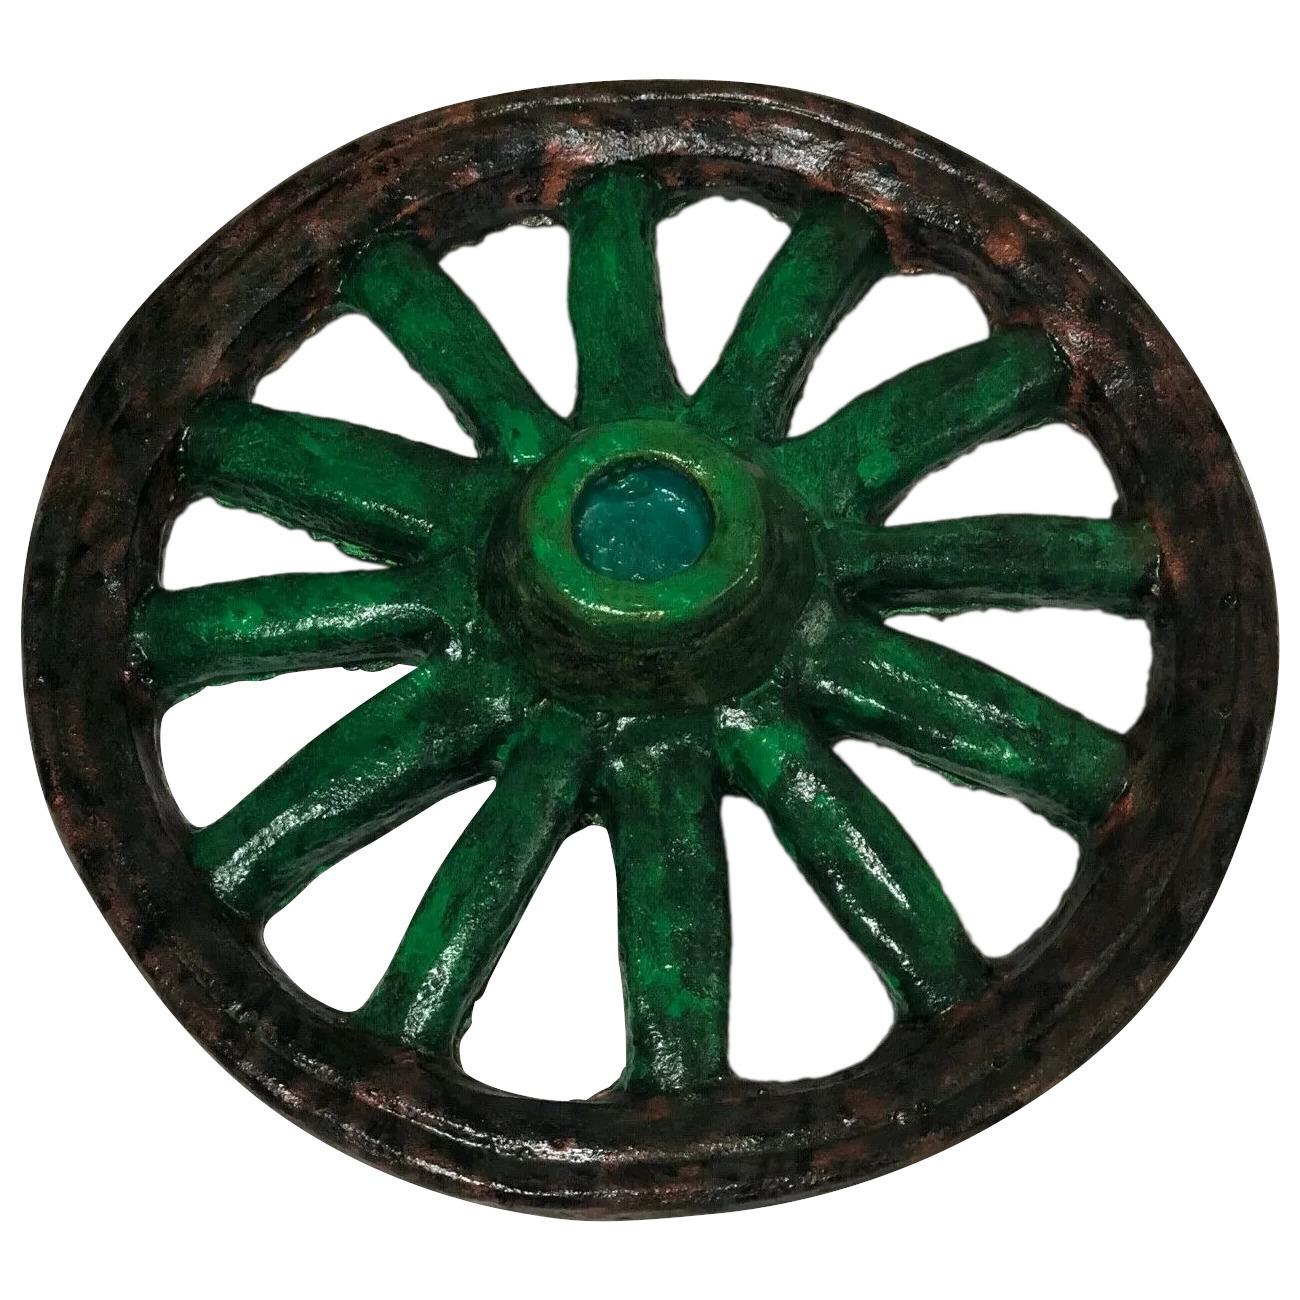 Fine Hand Painted Architectural Bronzed Stone Garden Wagon Wheel Display Ornament Statue Vinterior